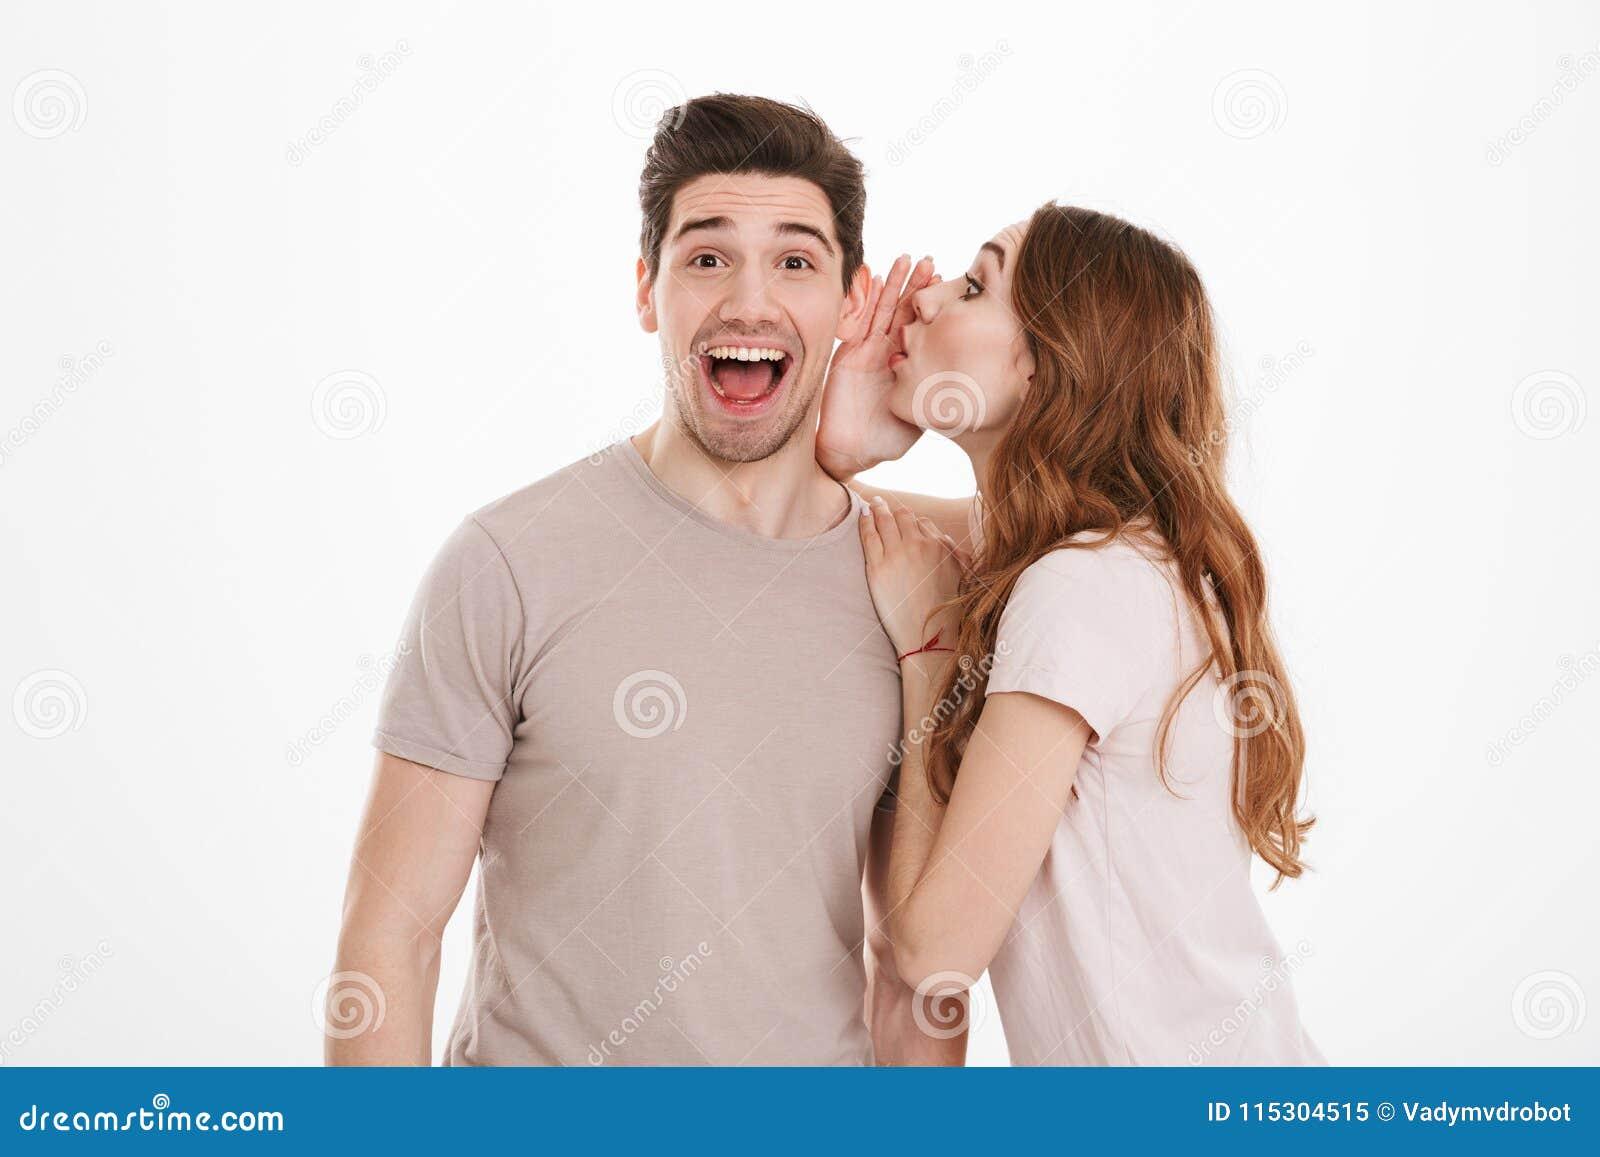 Images - Brunette licks girlfriend